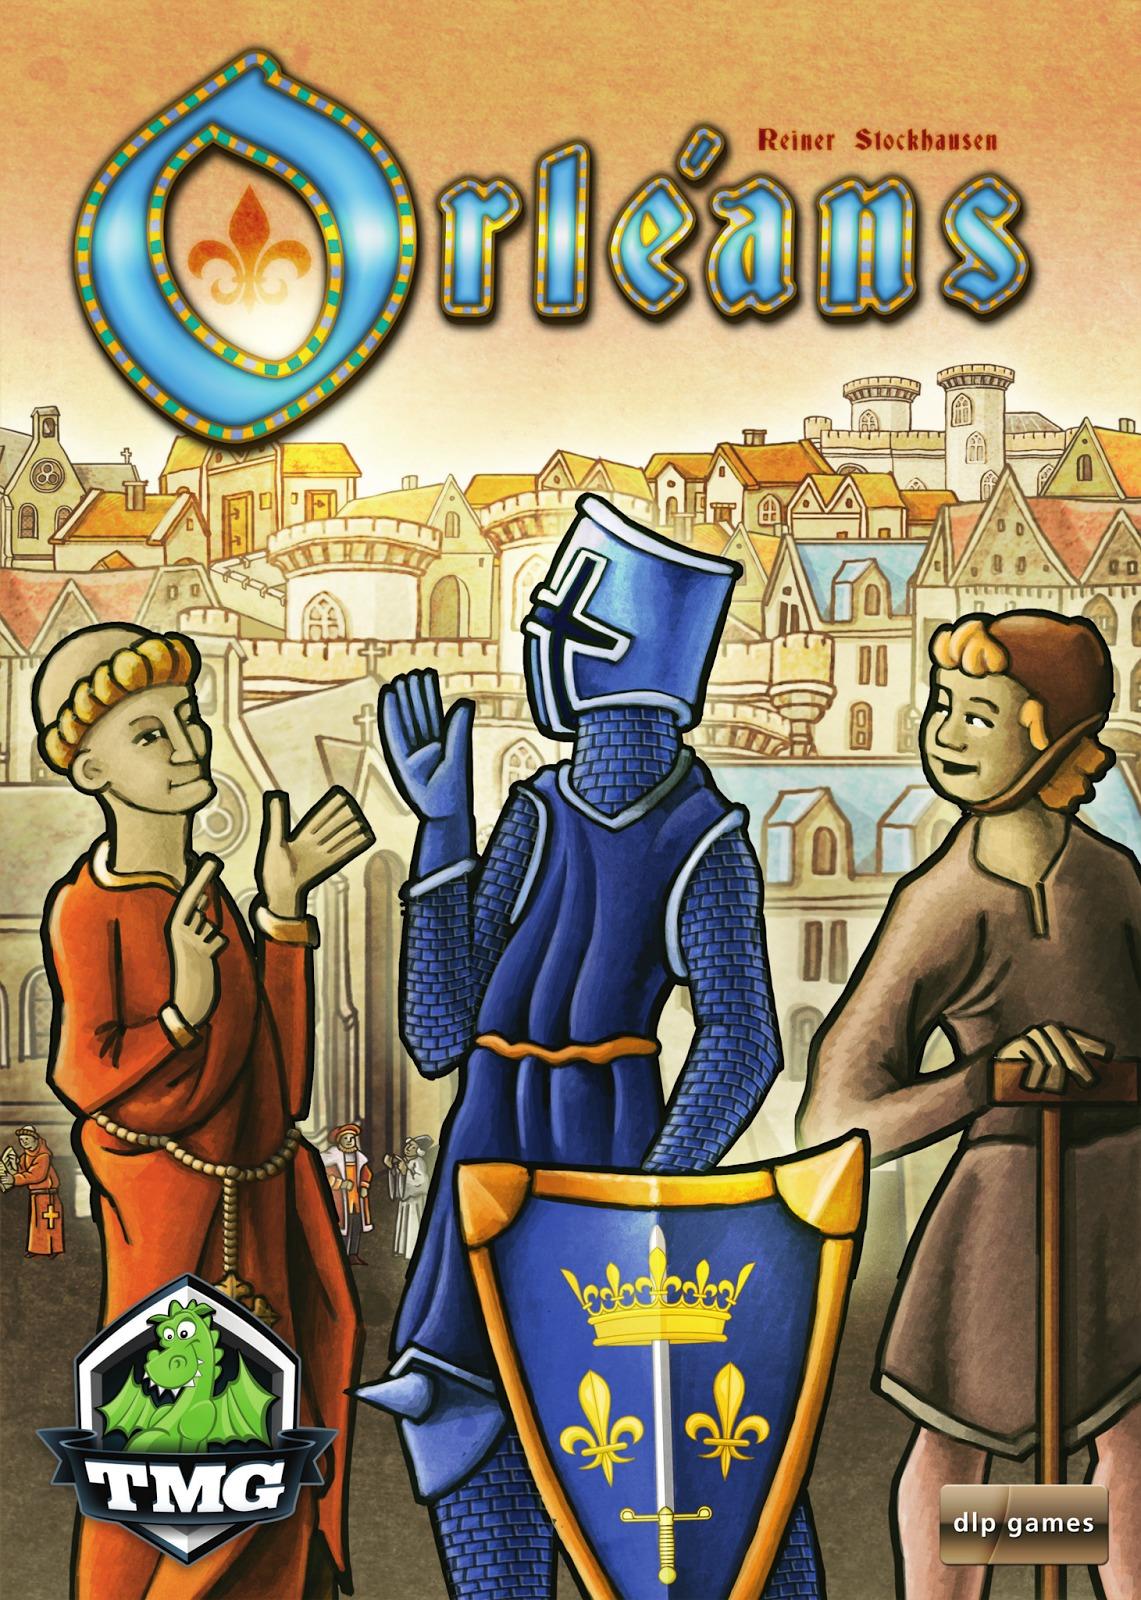 Orleans Cover - DLP Games